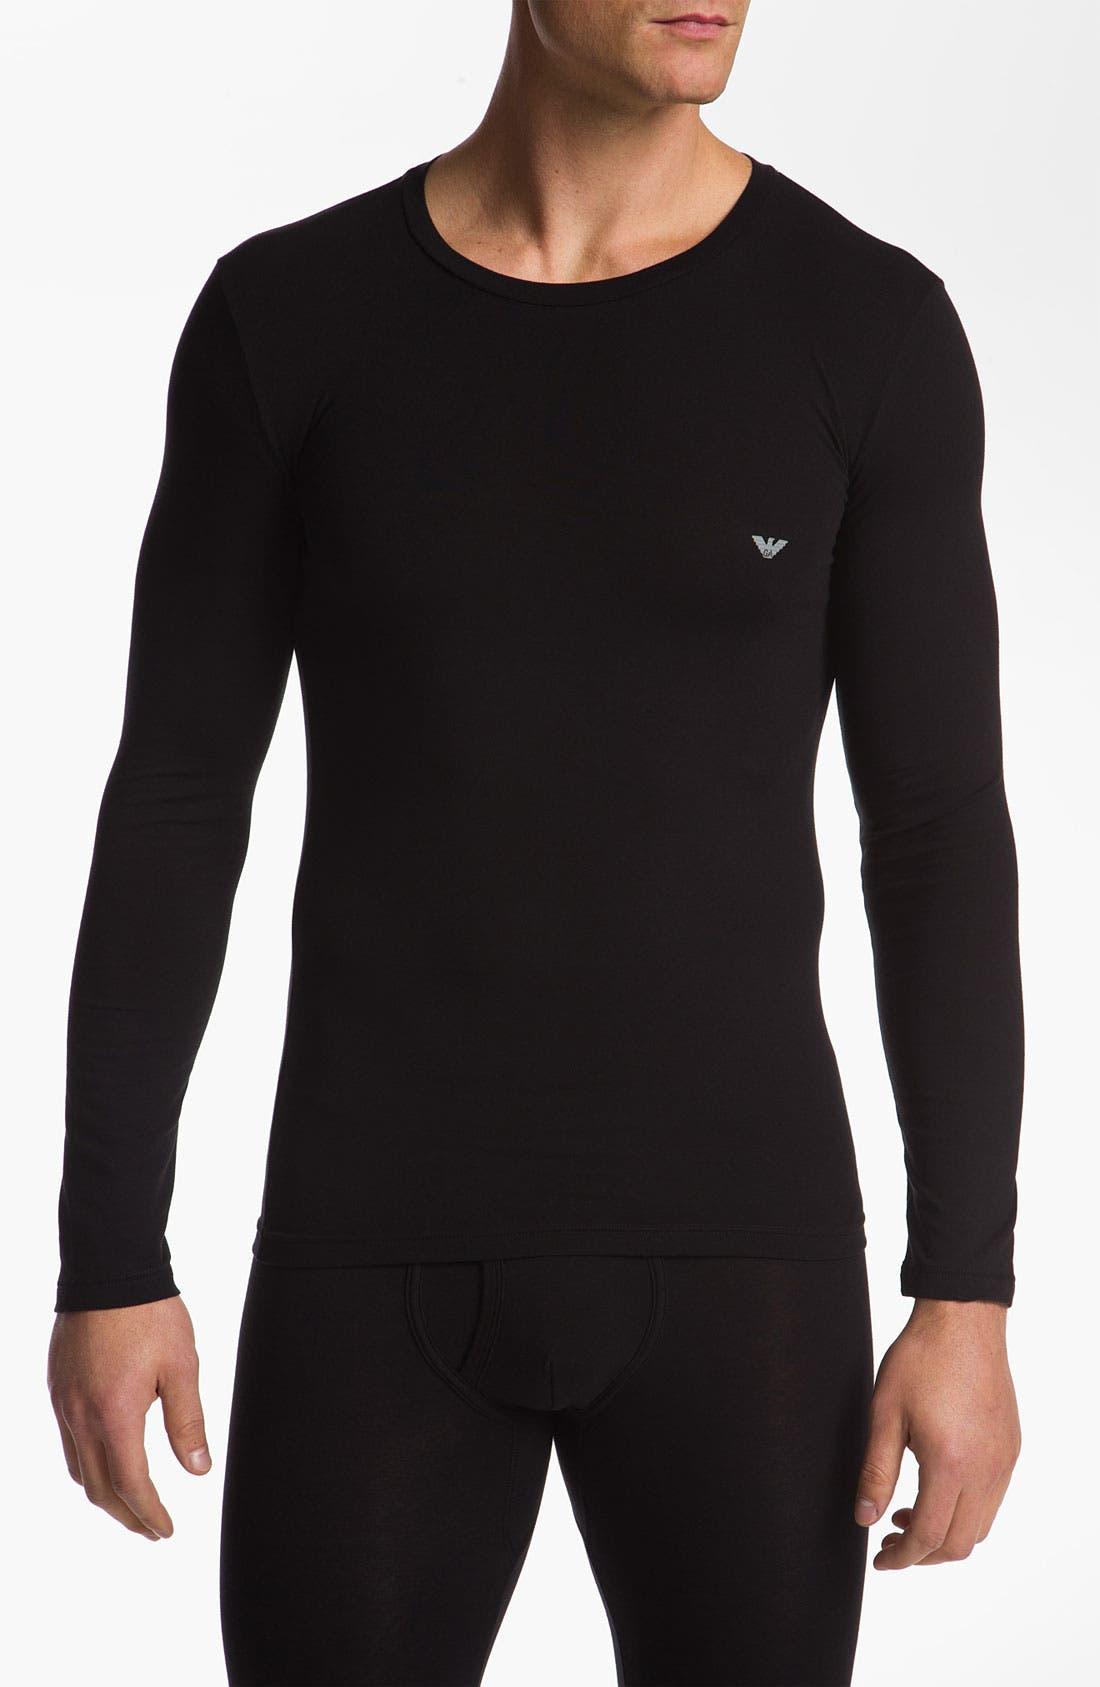 Alternate Image 1 Selected - Emporio Armani 'Basic' Long Sleeve Stretch T-Shirt